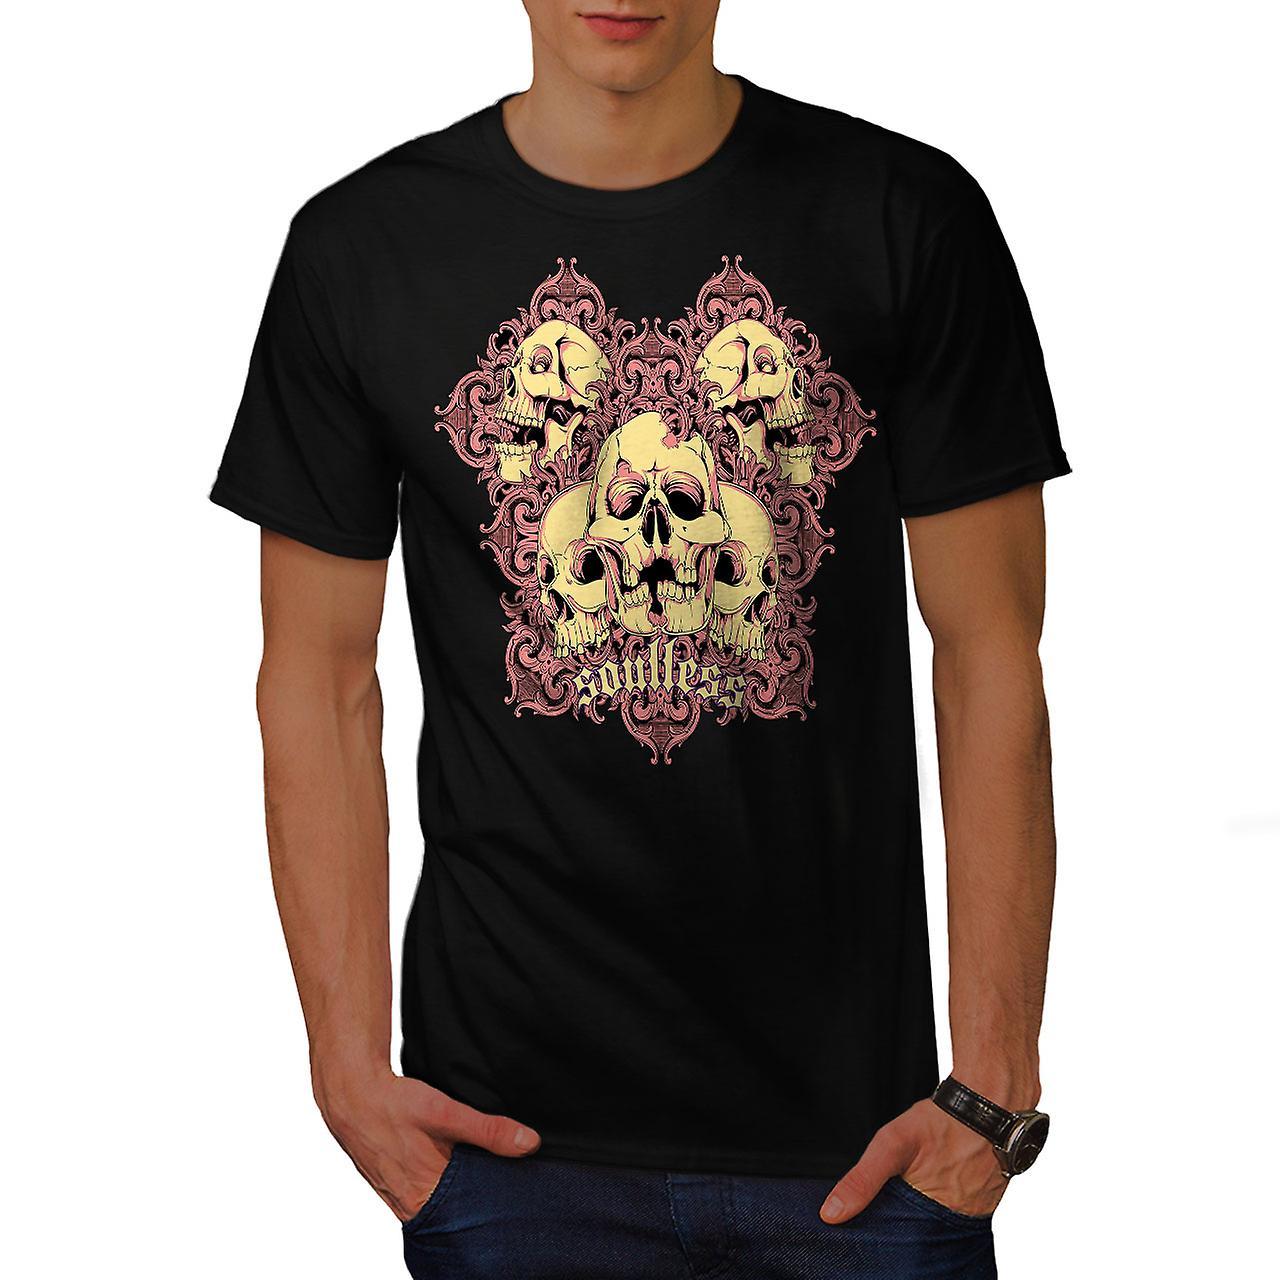 Soulless Goth Death Skull Men Black T-shirt | Wellcoda